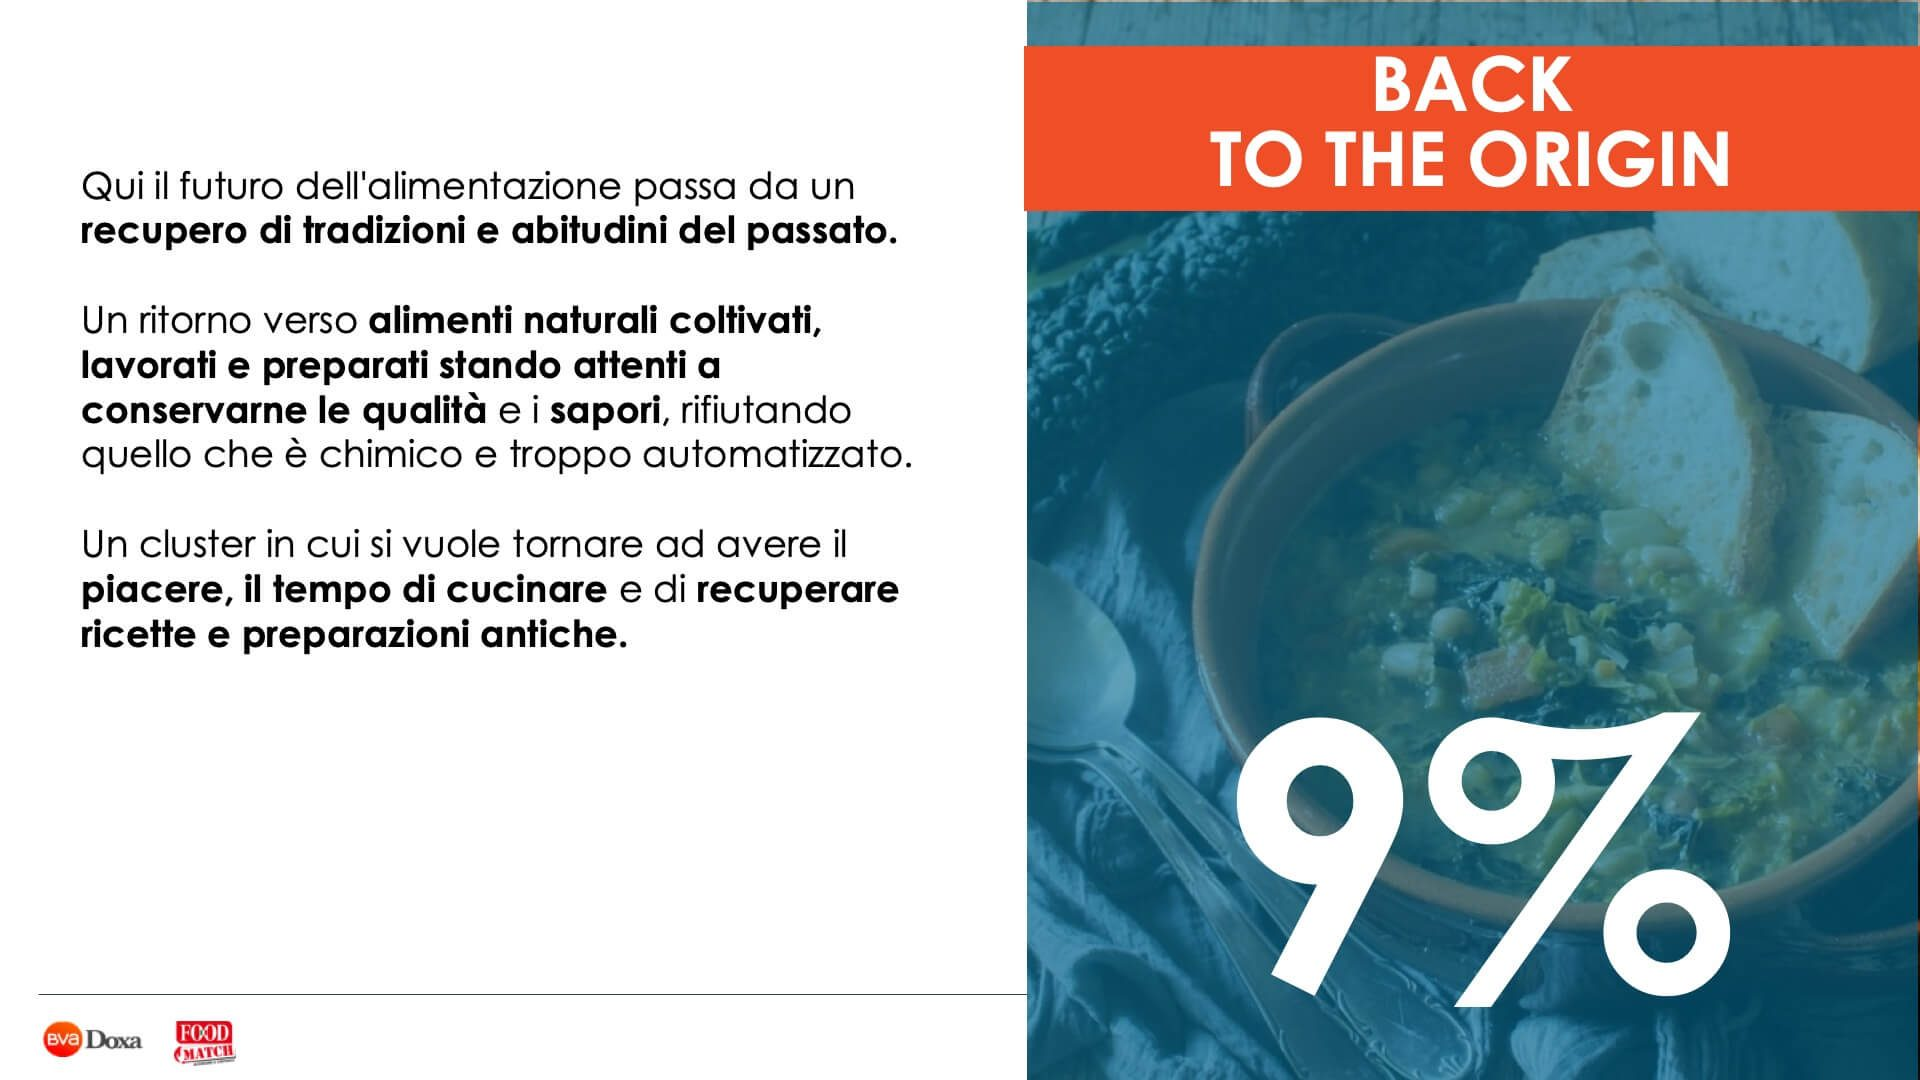 Food Innovation Conti Doxa Bva 09